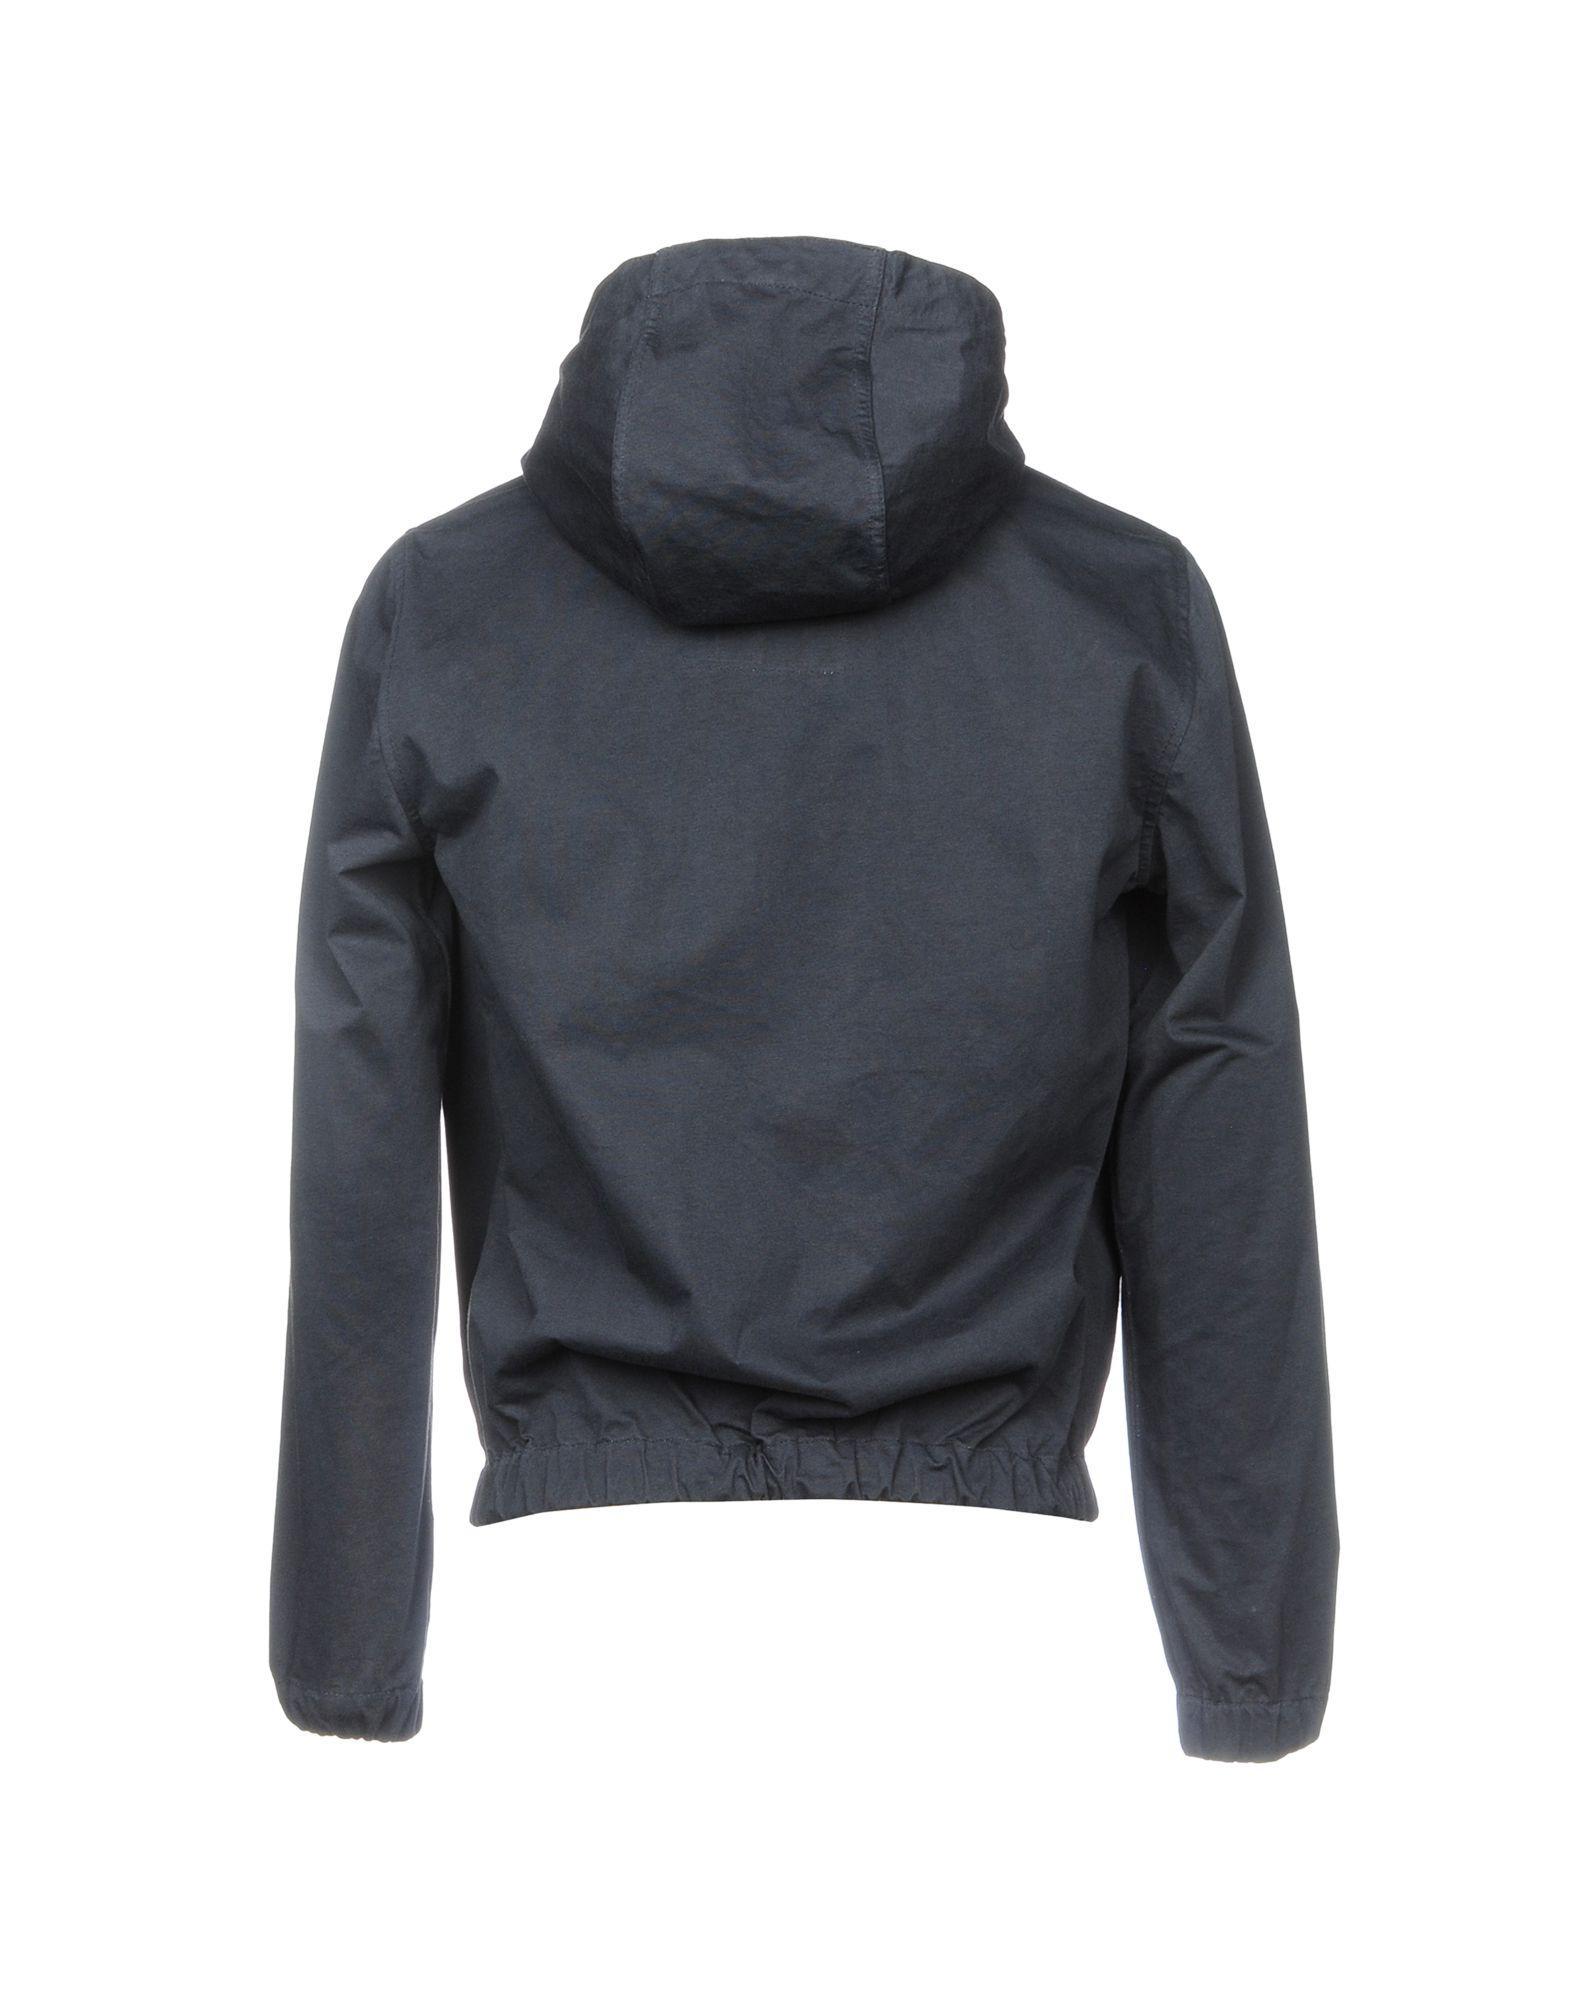 Temporary K Cotton Jackets in Dark Blue (Blue) for Men